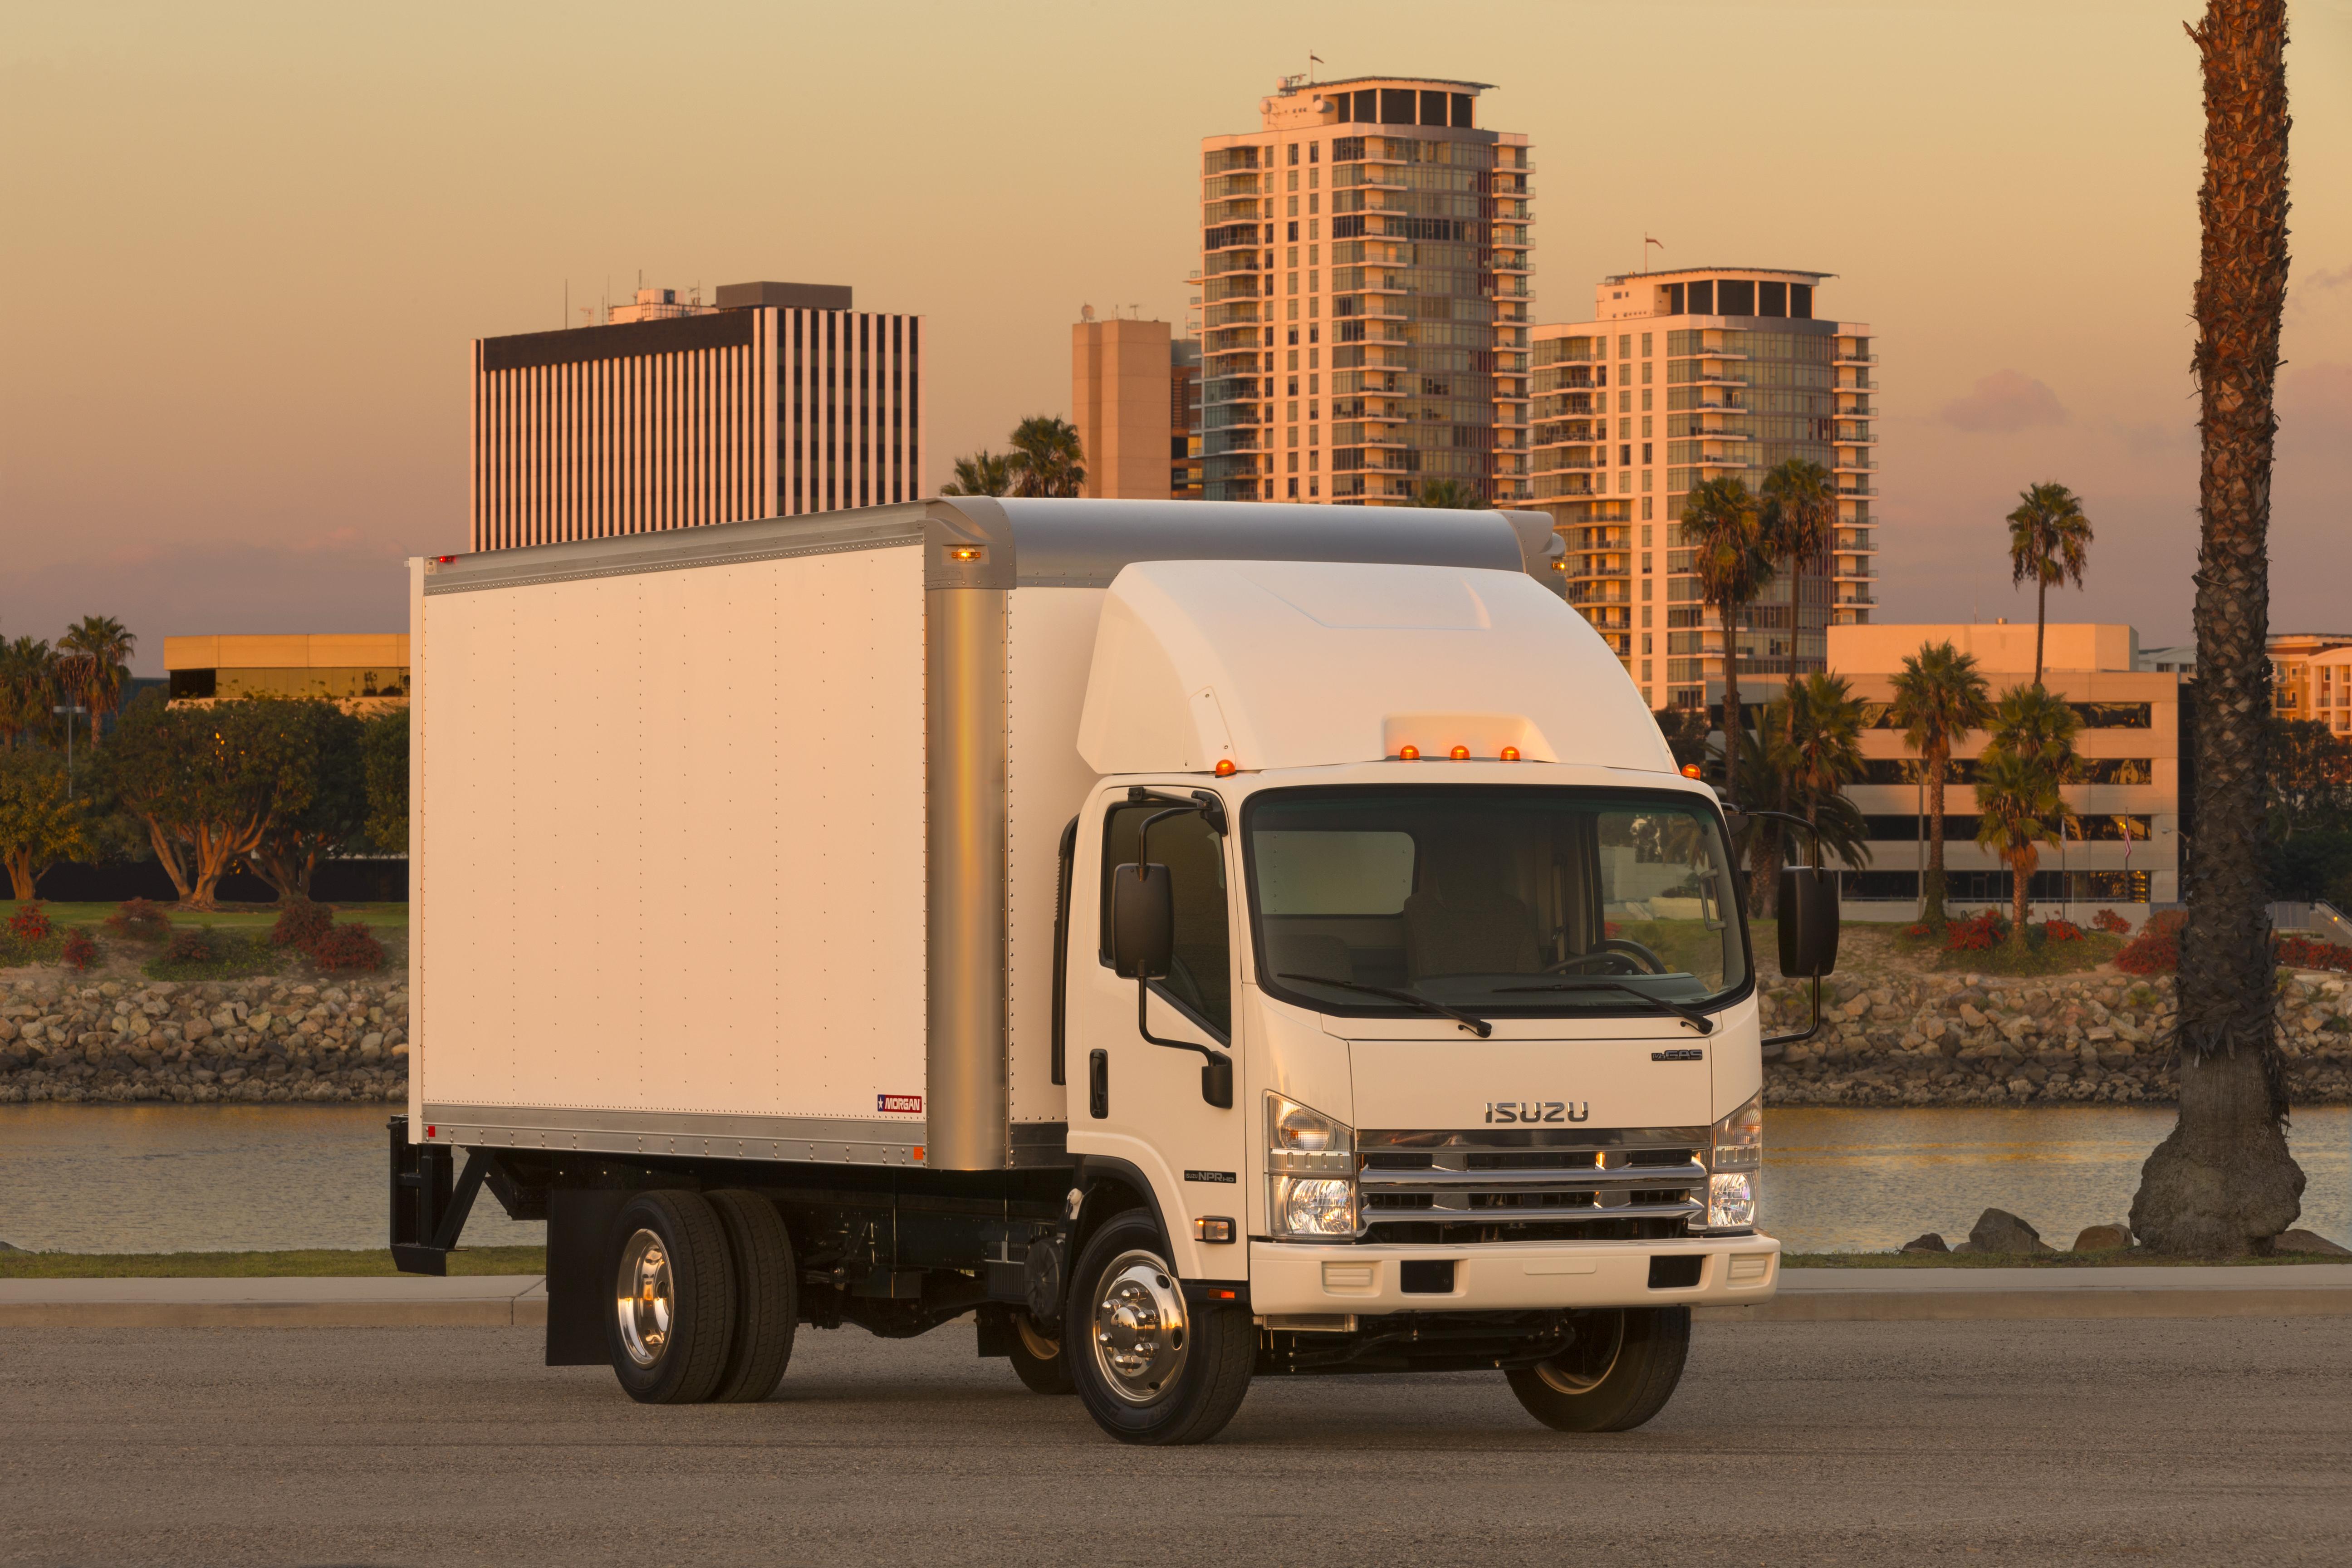 Isuzu Introduces New 2014 and 2015 N-Series Diesel Models